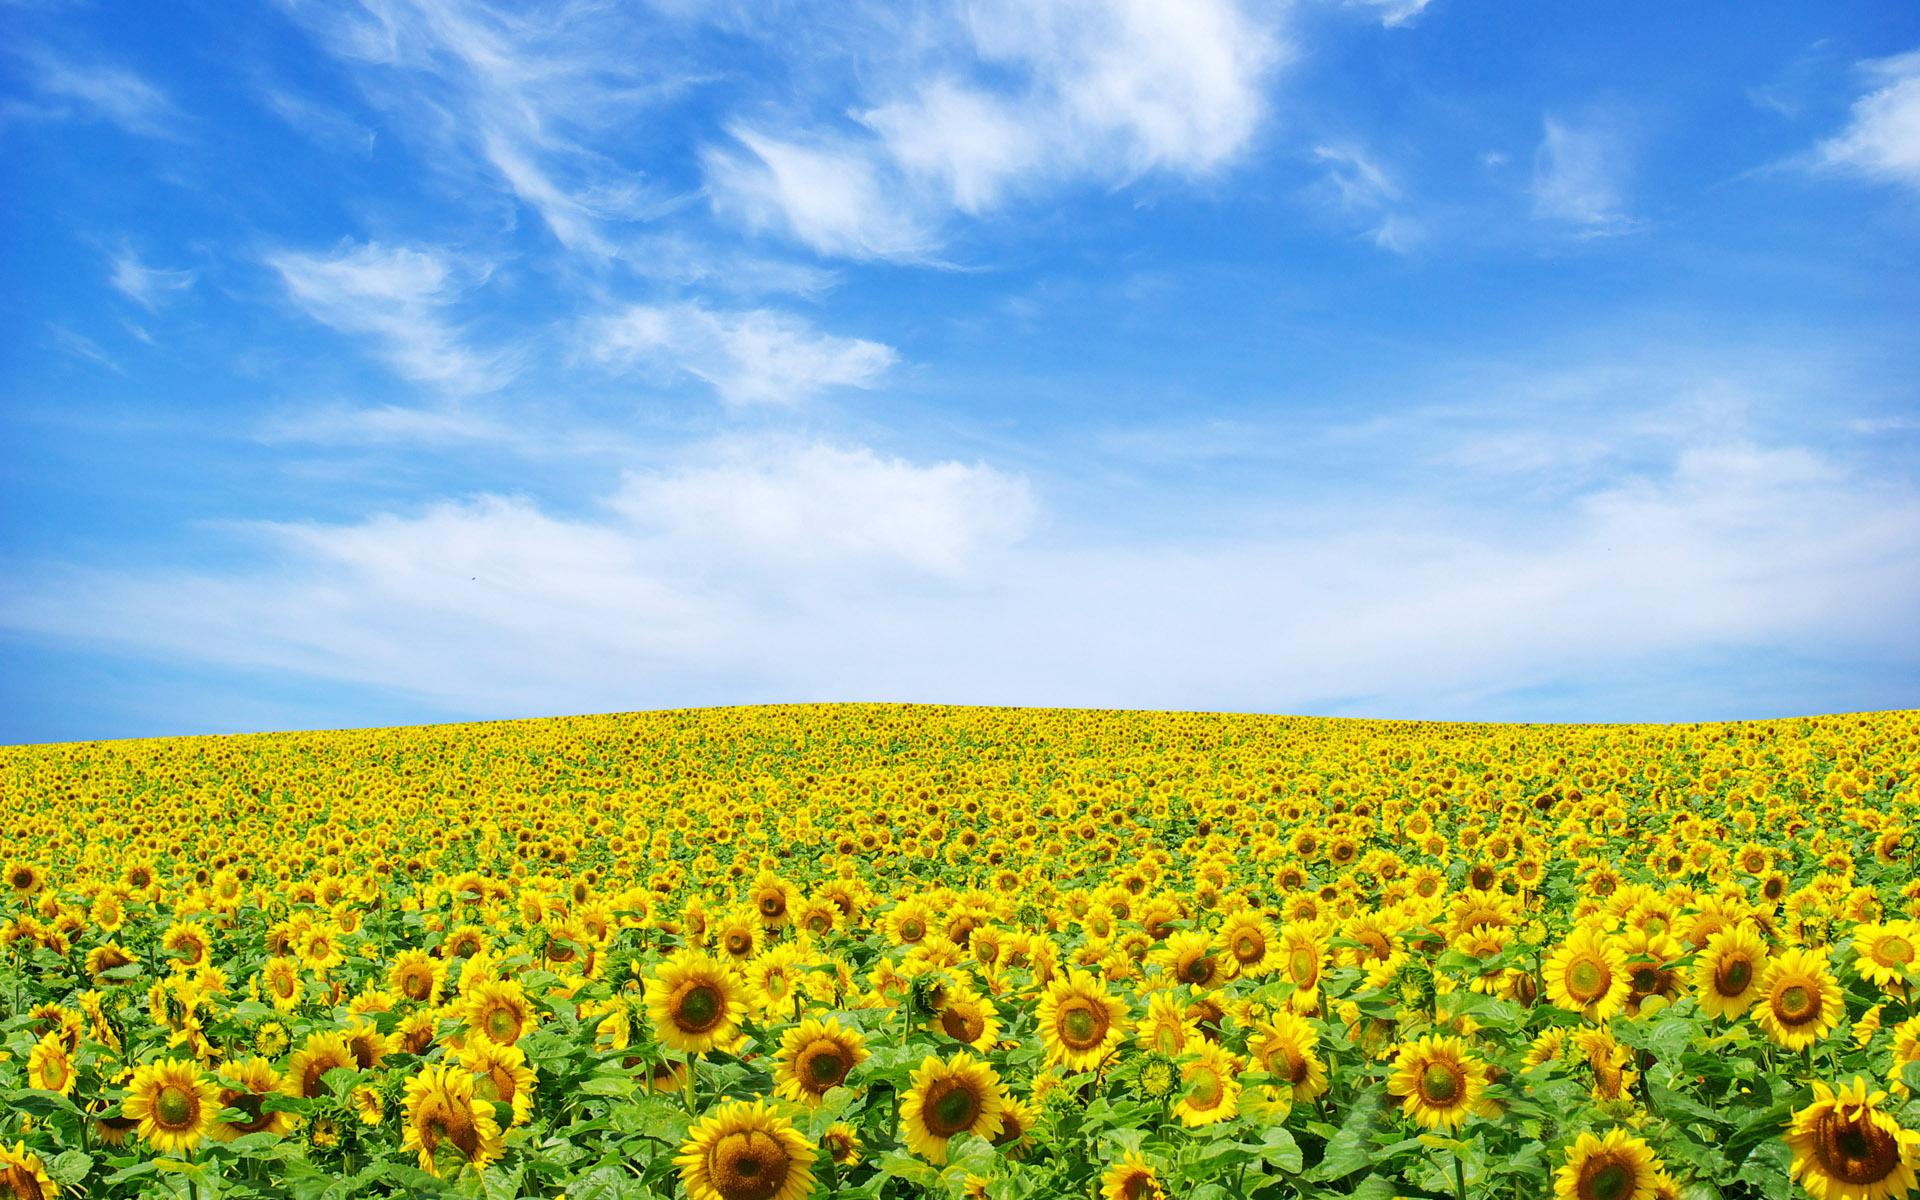 Sunflower Landscape Wallpapers HD Wallpapers 1920x1200